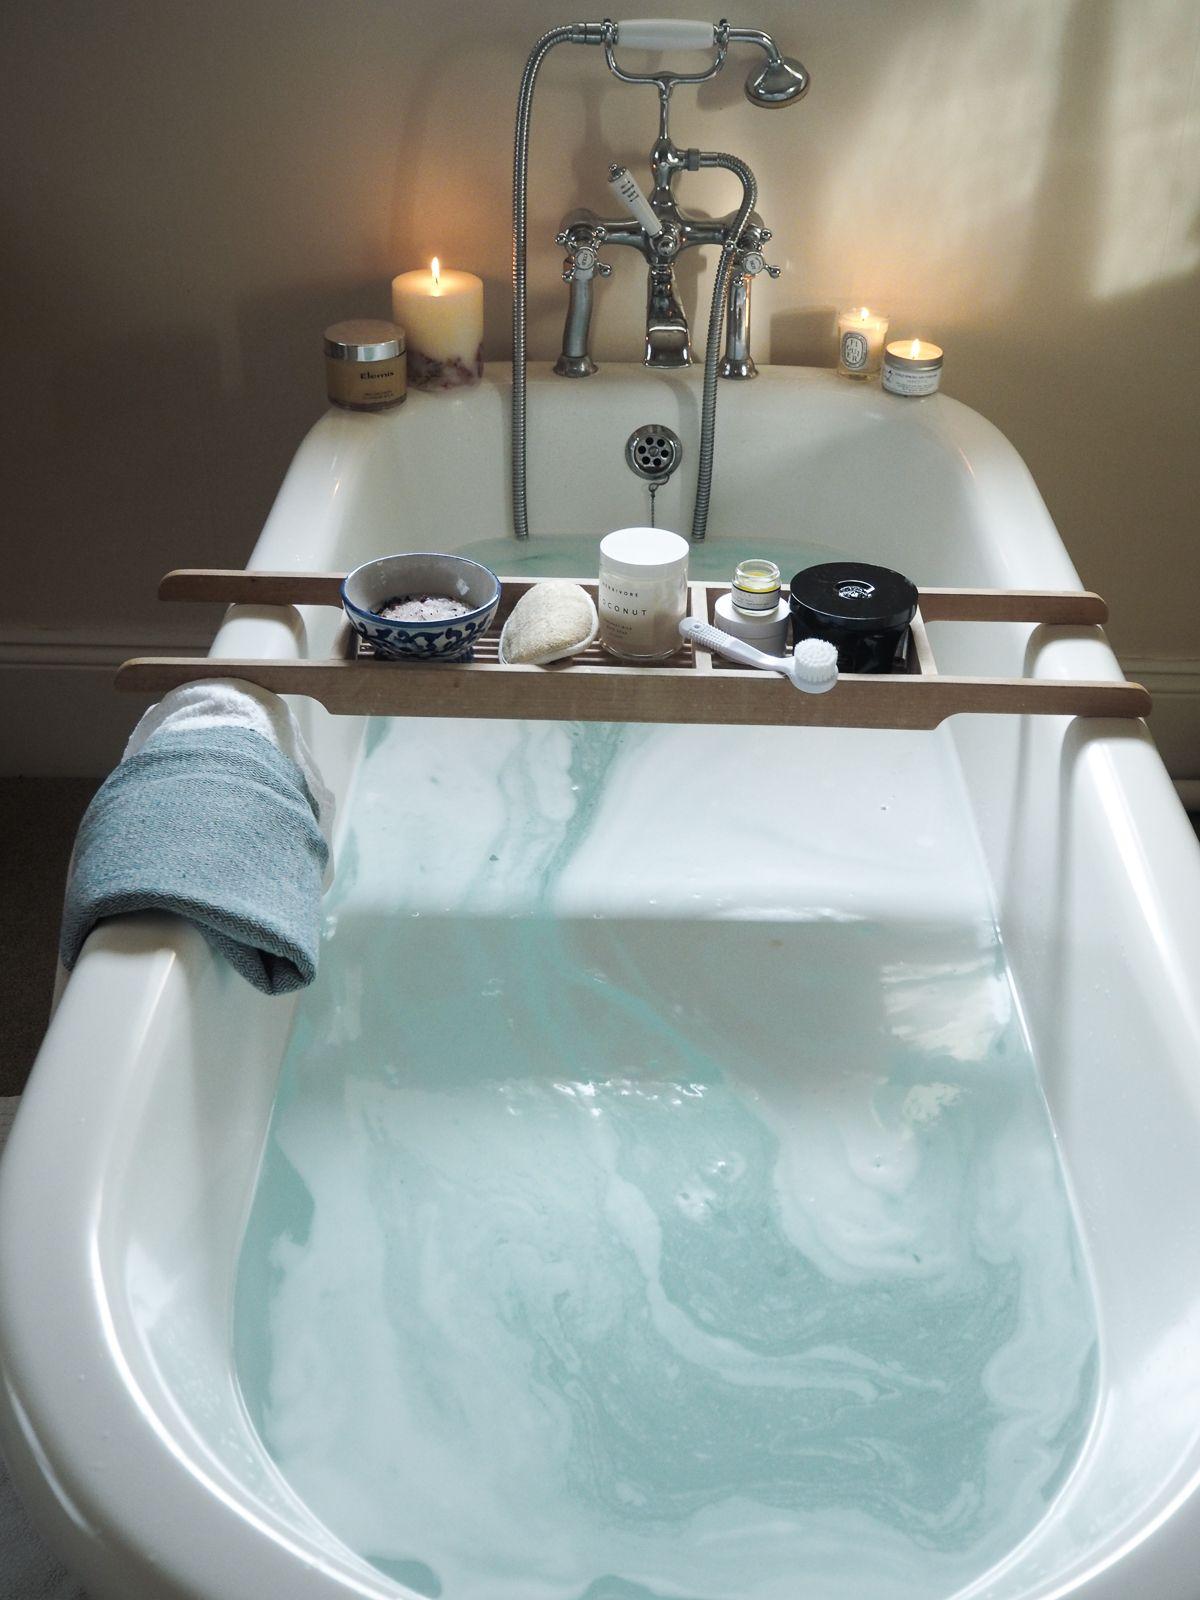 The Ultimate Bath Recipe   Fashion Me Now   Home   Pinterest   Bath ...